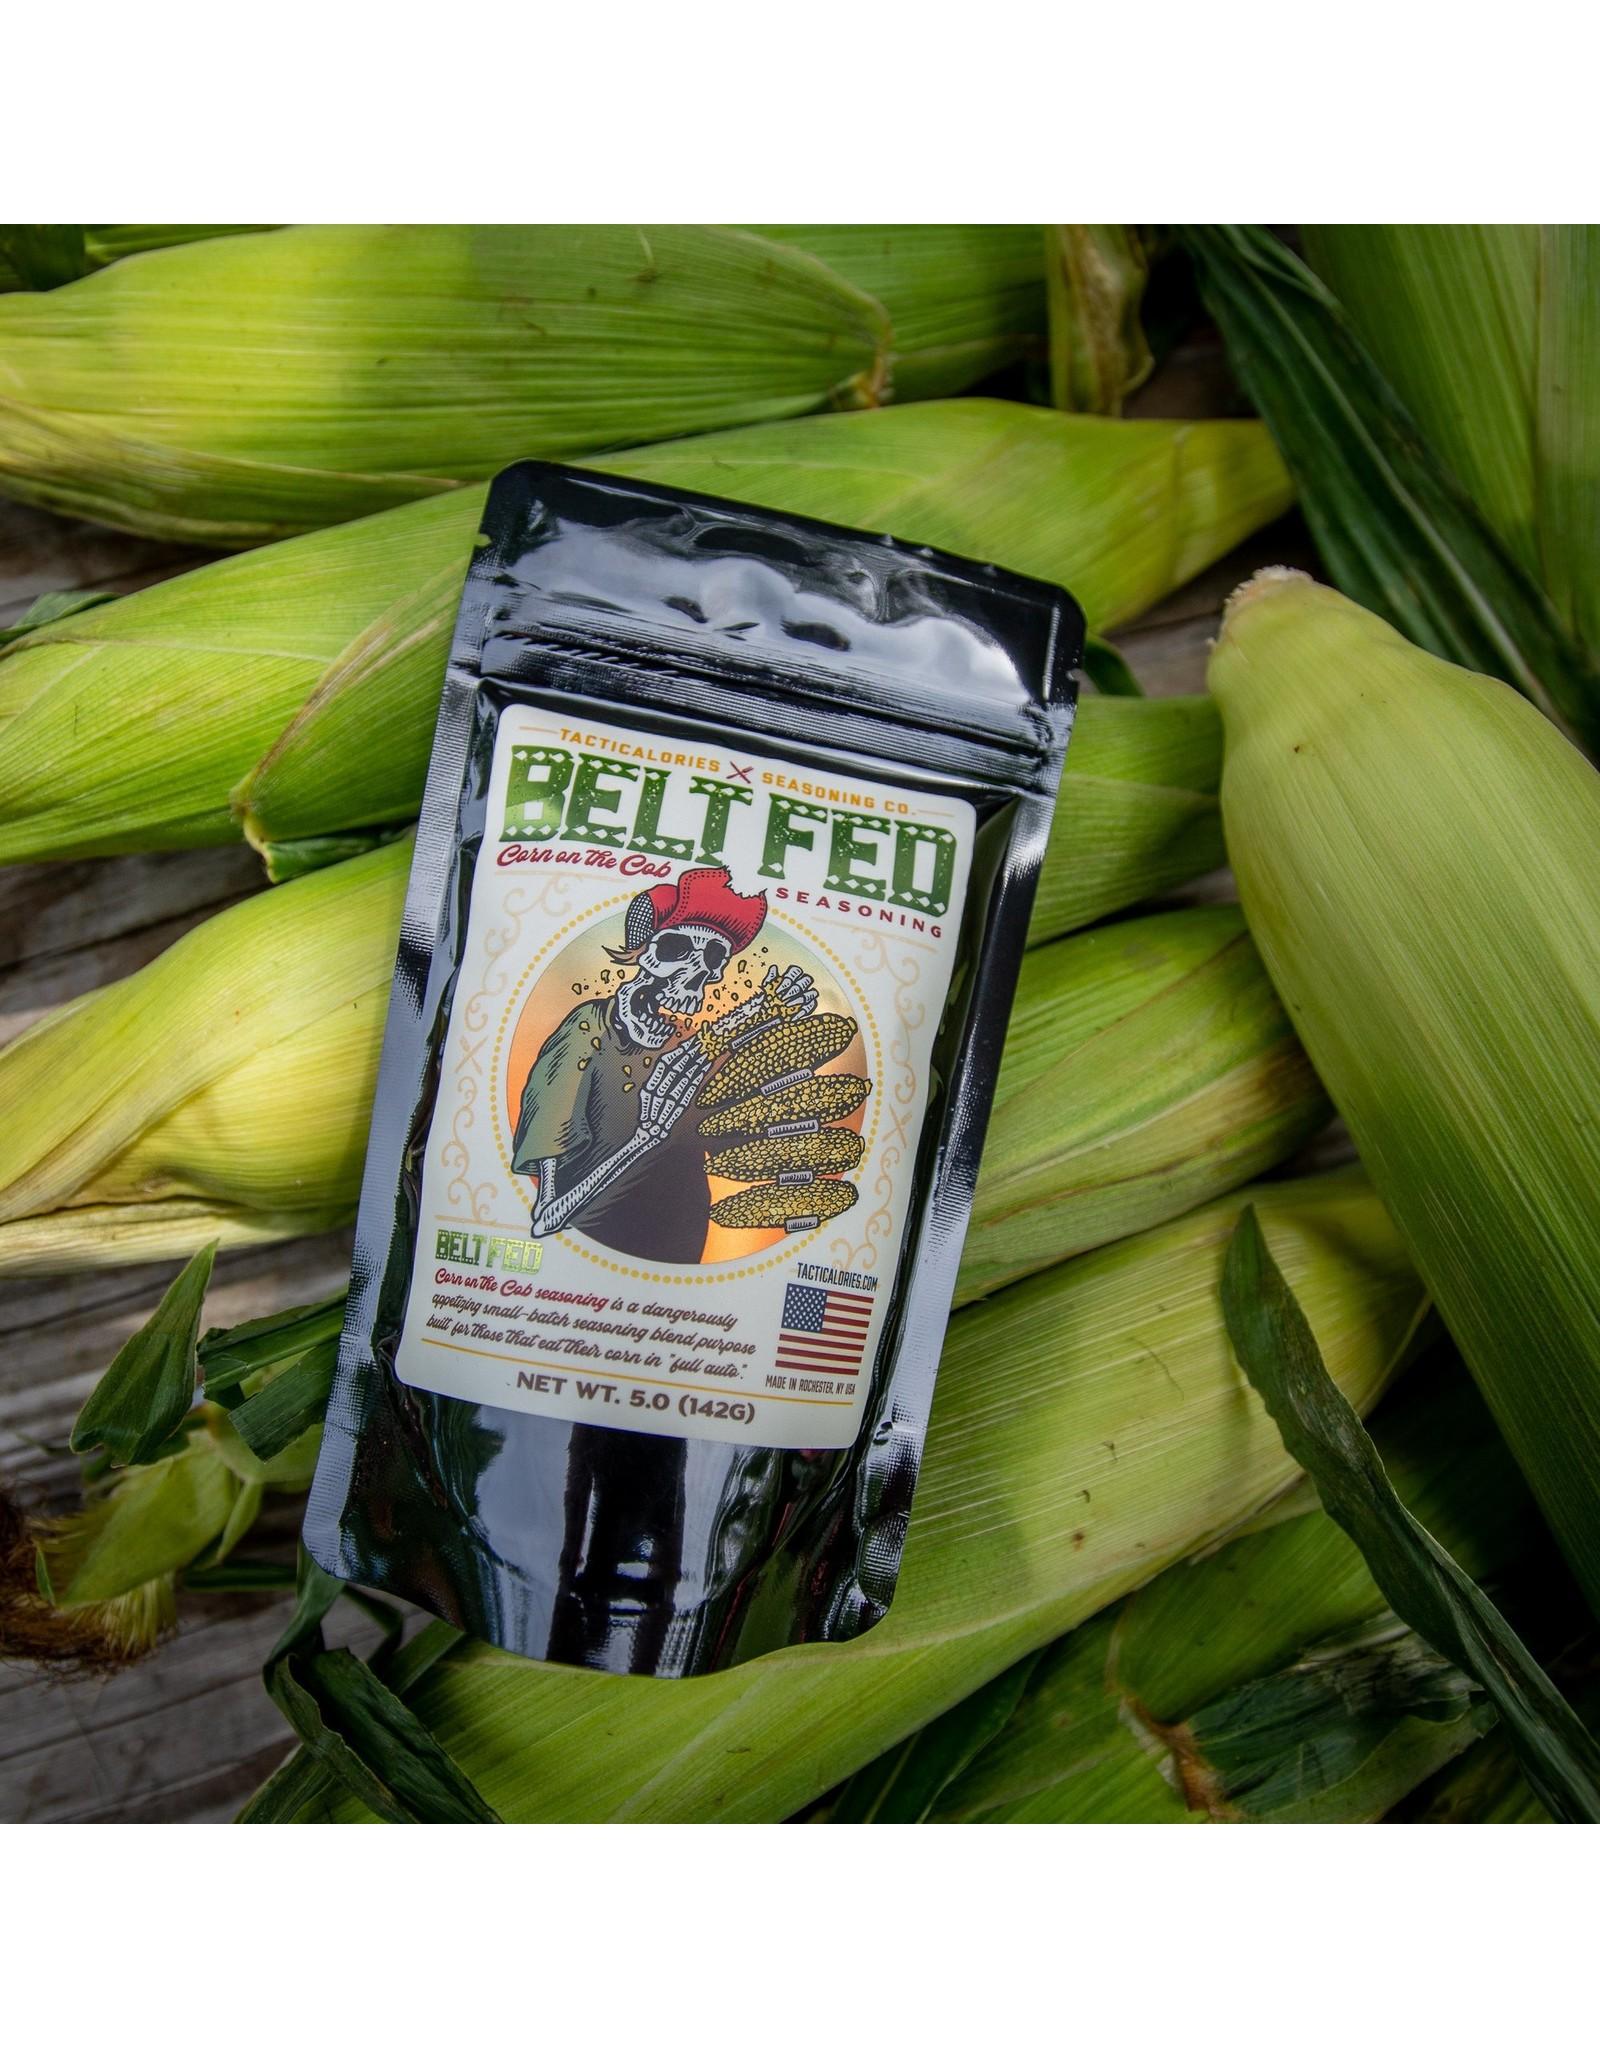 Tacticalories Belt Fed - Corn On The Cob